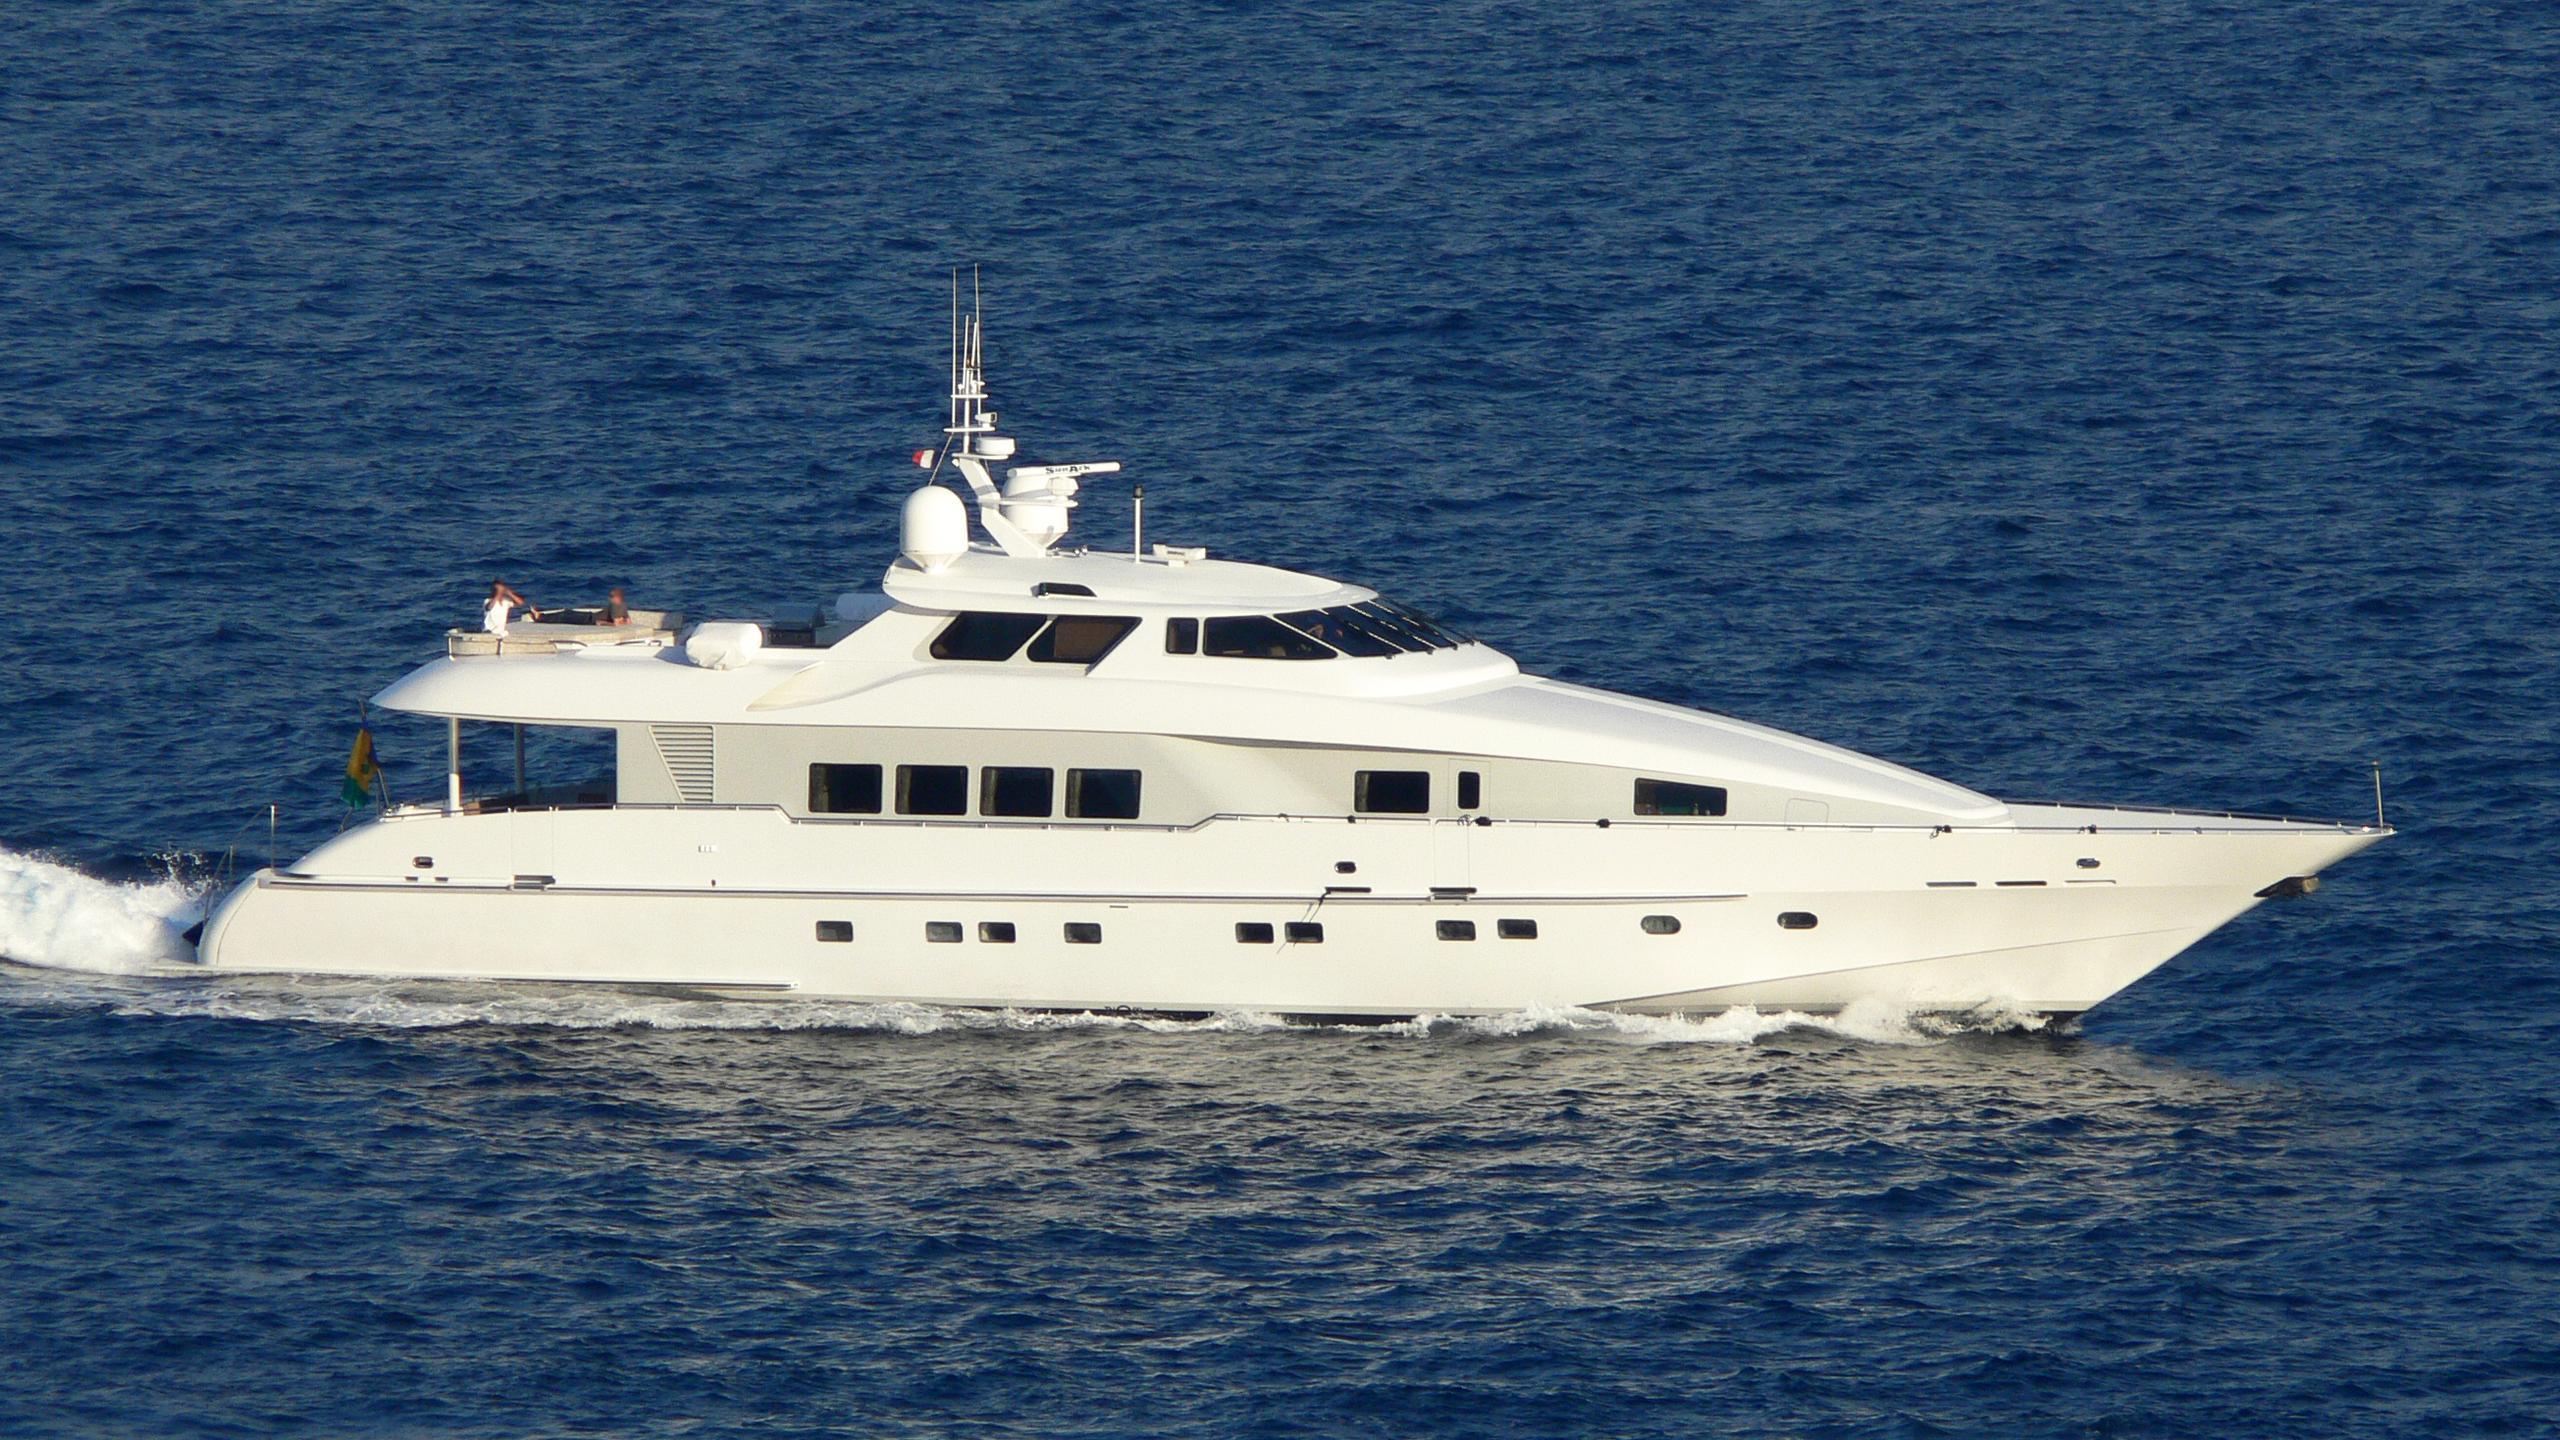 sun-ark-motor-yacht-heesen-1995-37m-cruising-profile